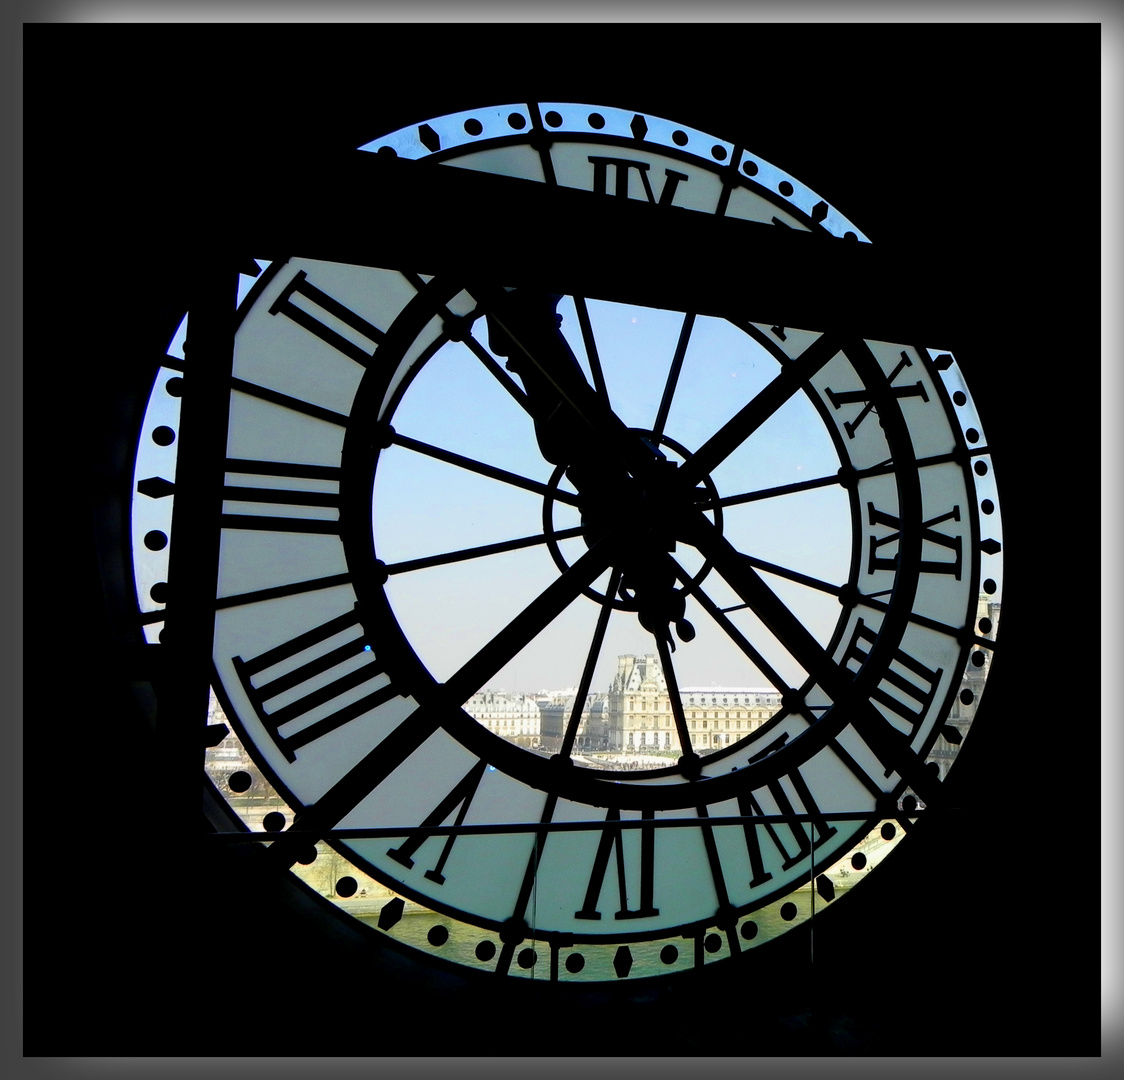 La grande horloge d'Orsay